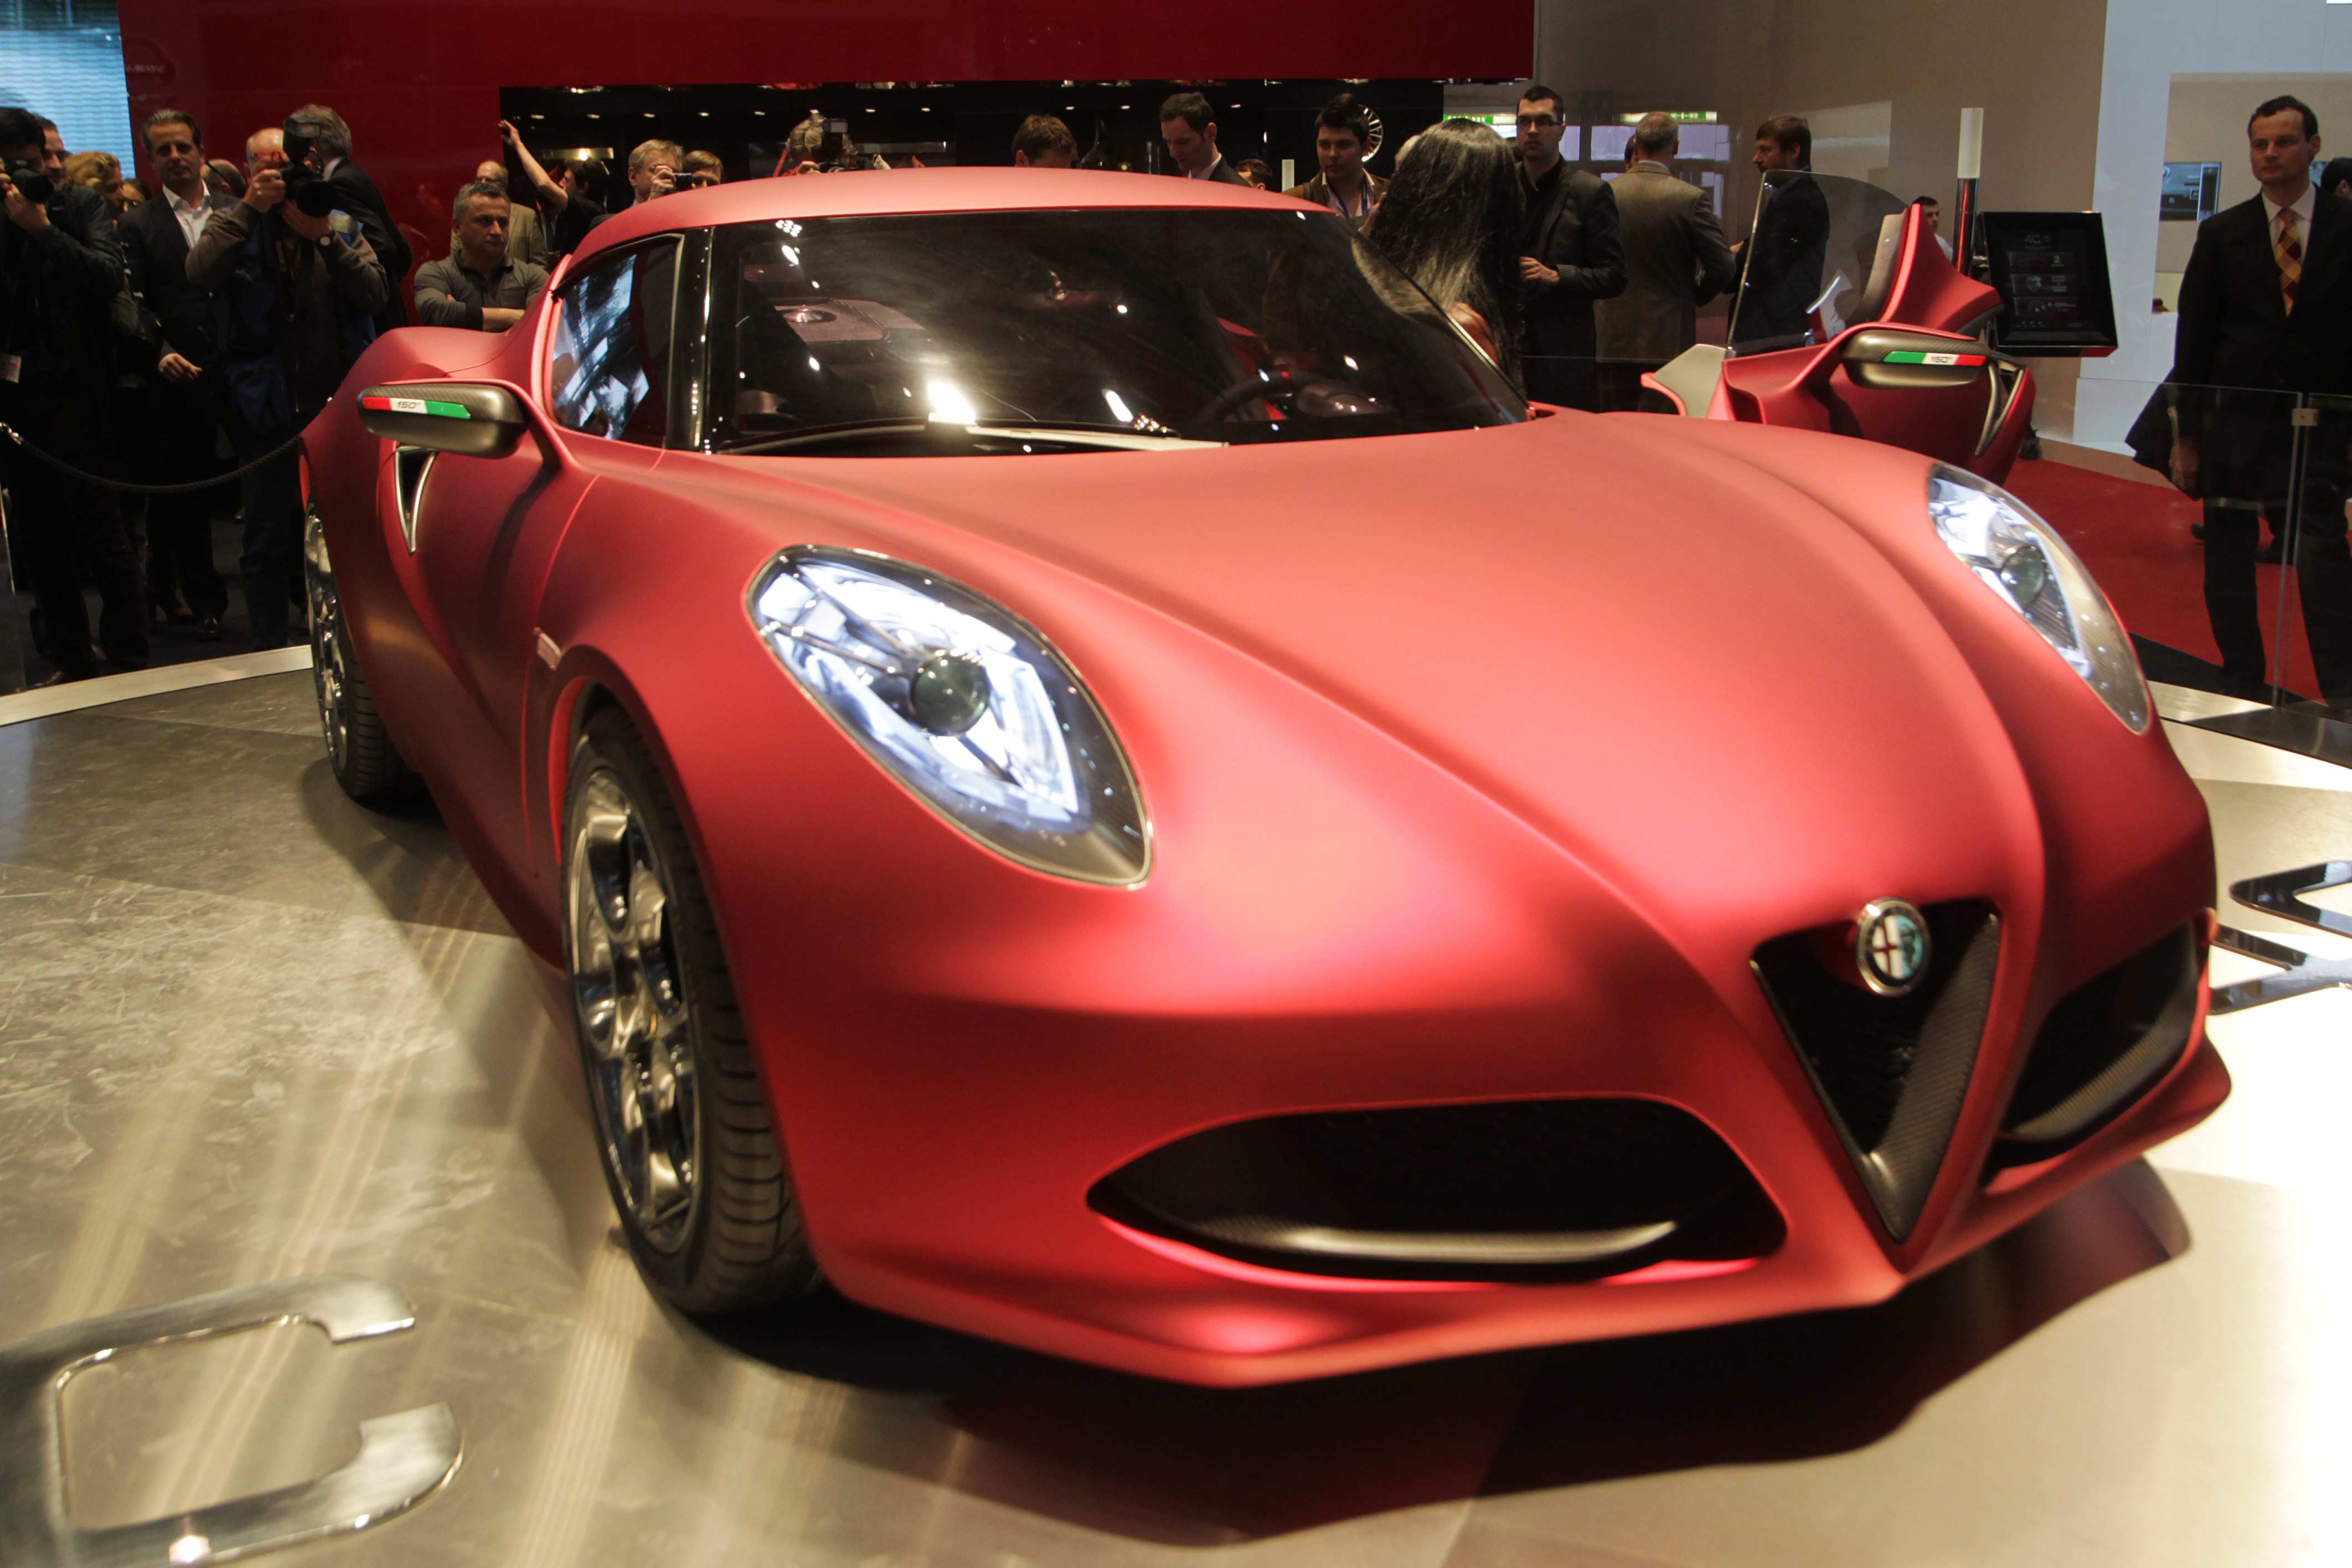 An Alfa Romeo 4C is displayed at the car